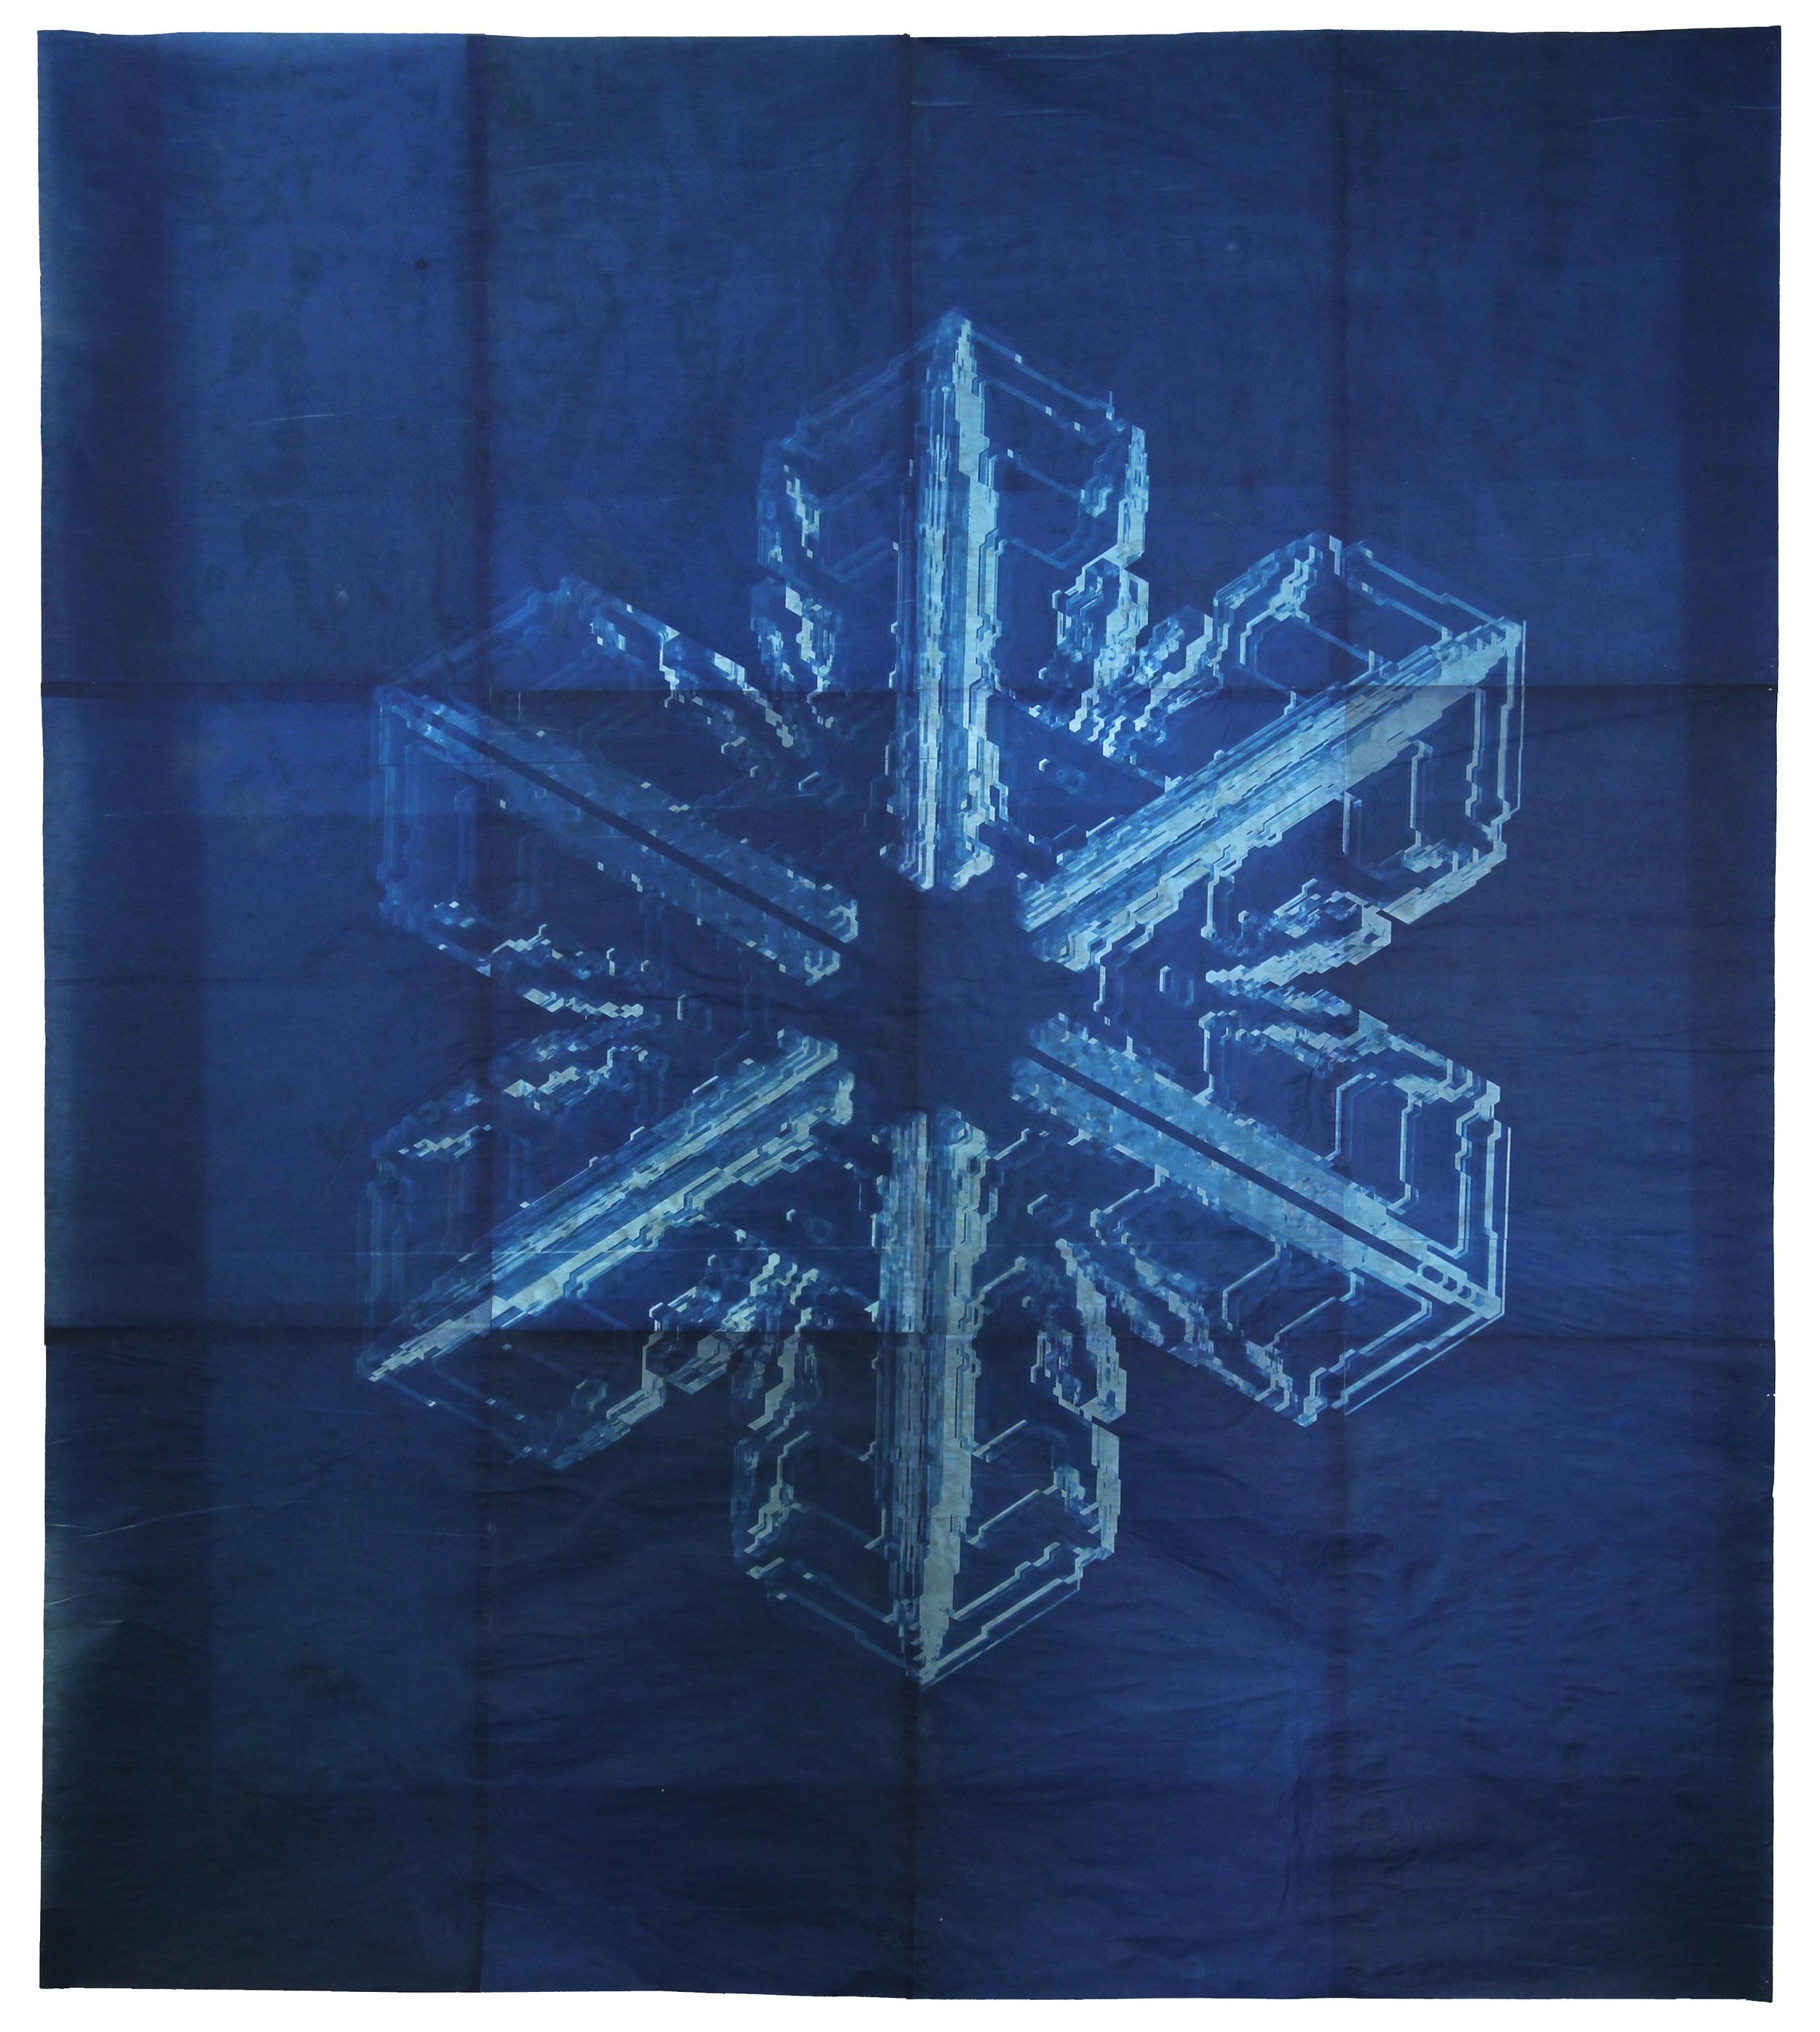 Snowflake #10, 2011